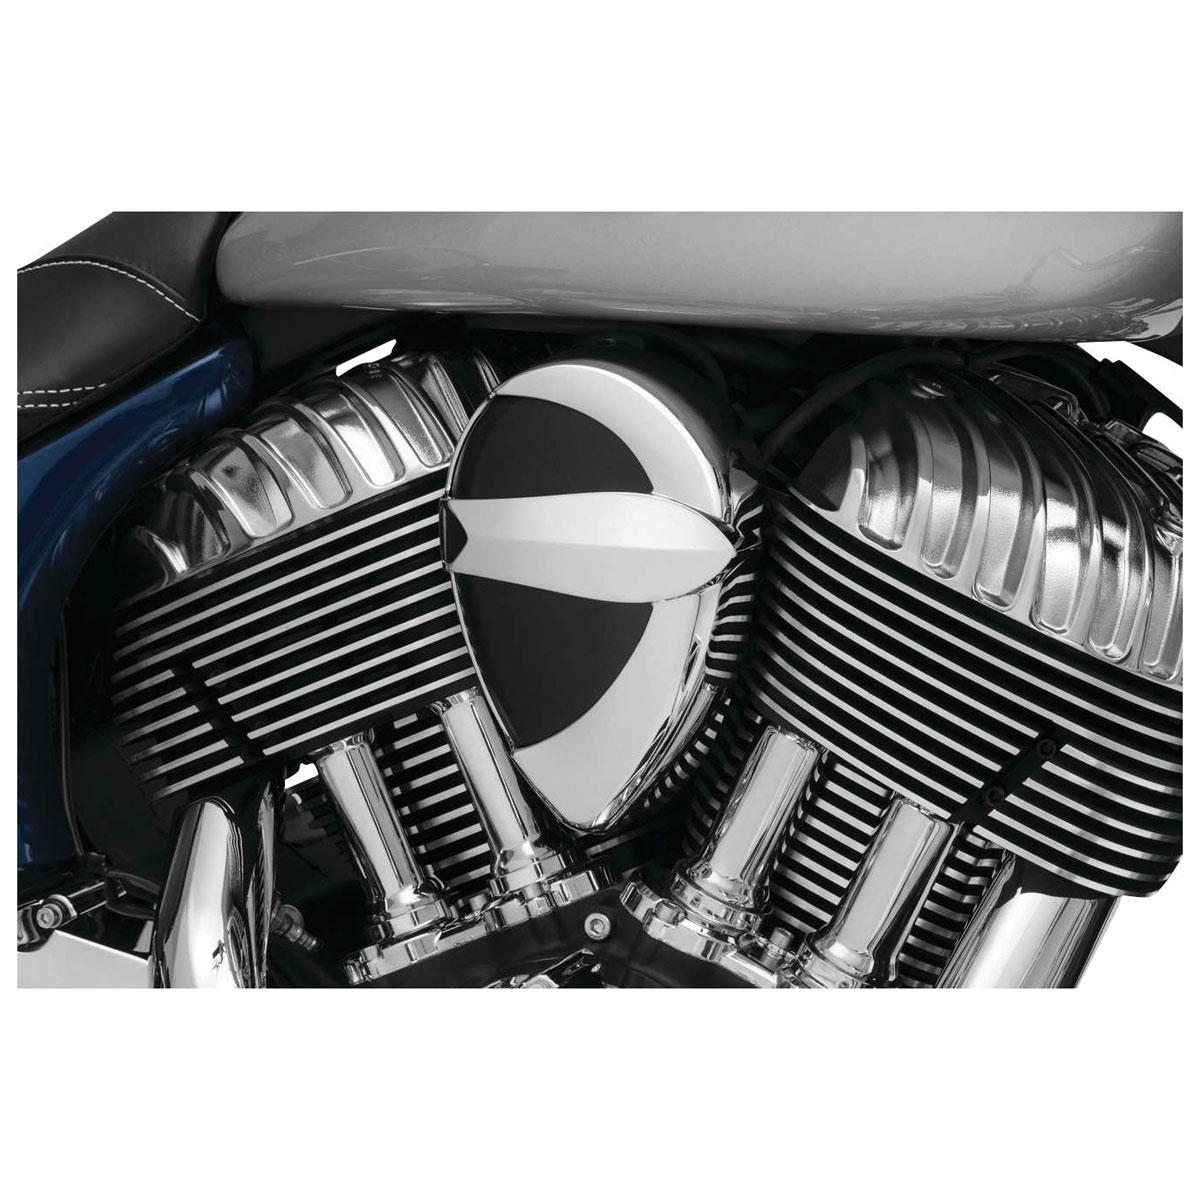 Kuryakyn Chrome John Shope Signature Series Horn Cover